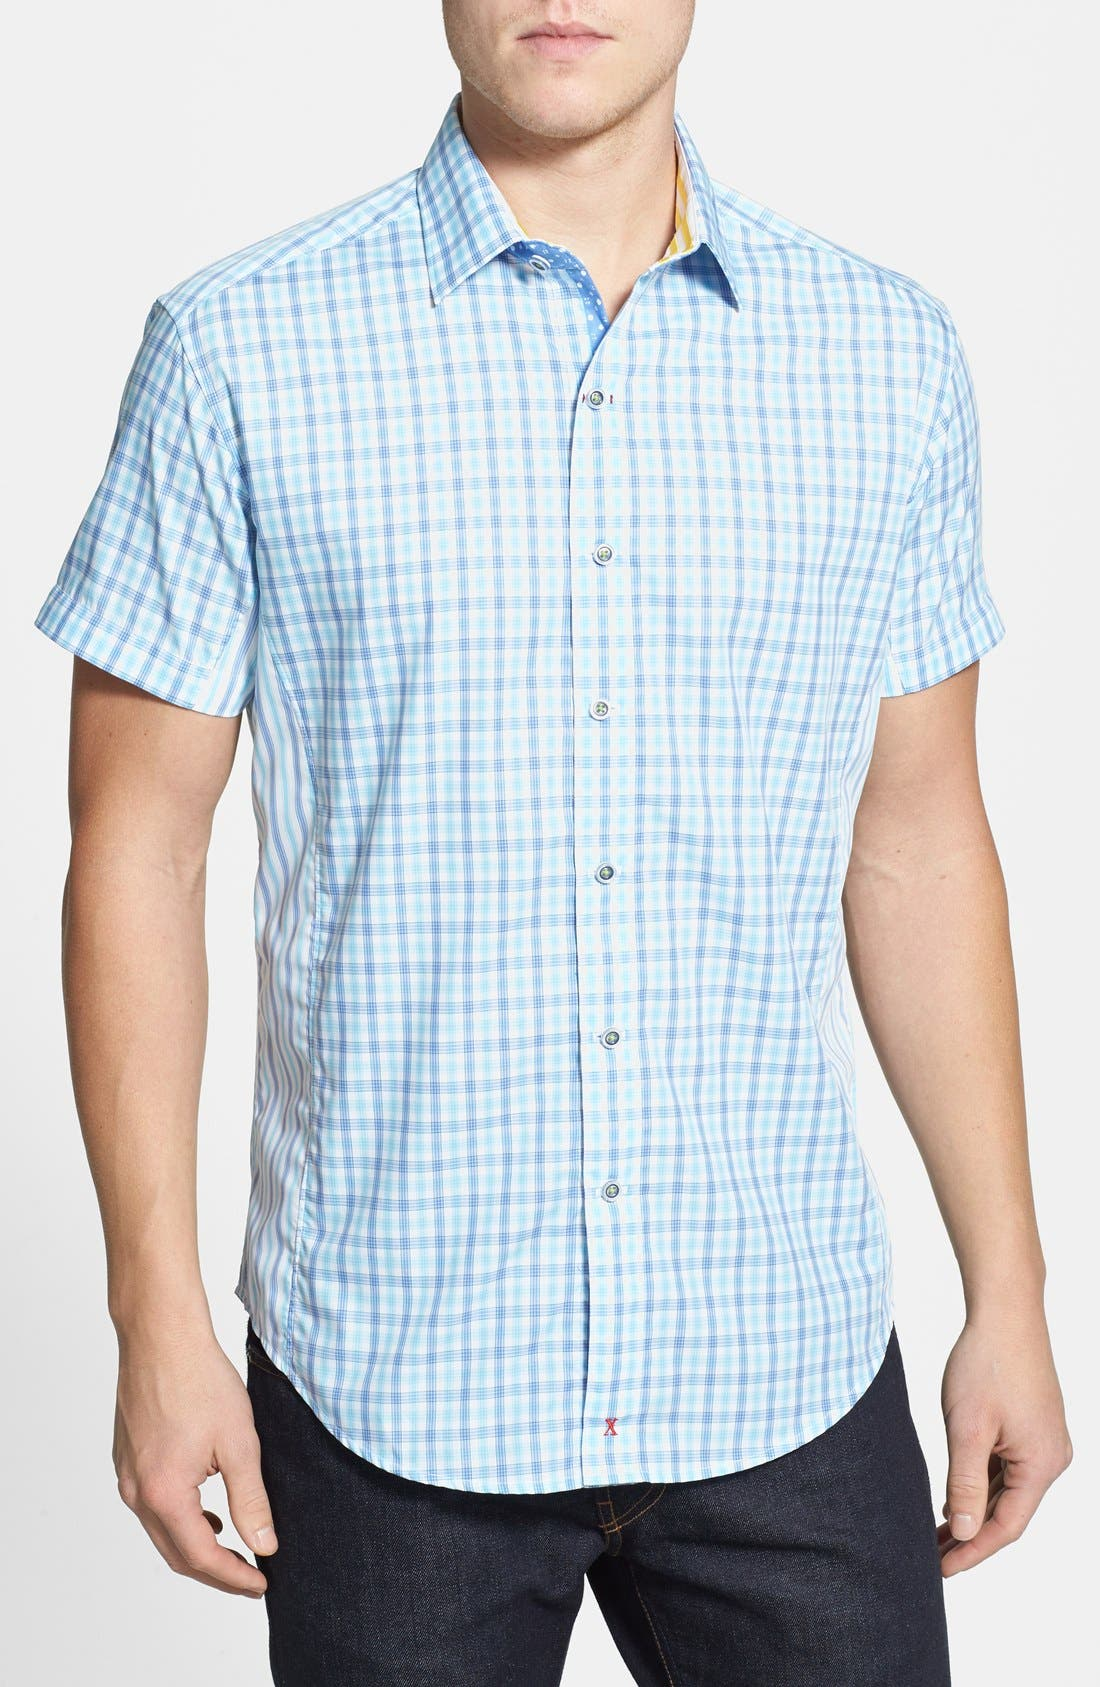 Alternate Image 1 Selected - Robert Graham 'Fields' Tailored Fit Sport Shirt